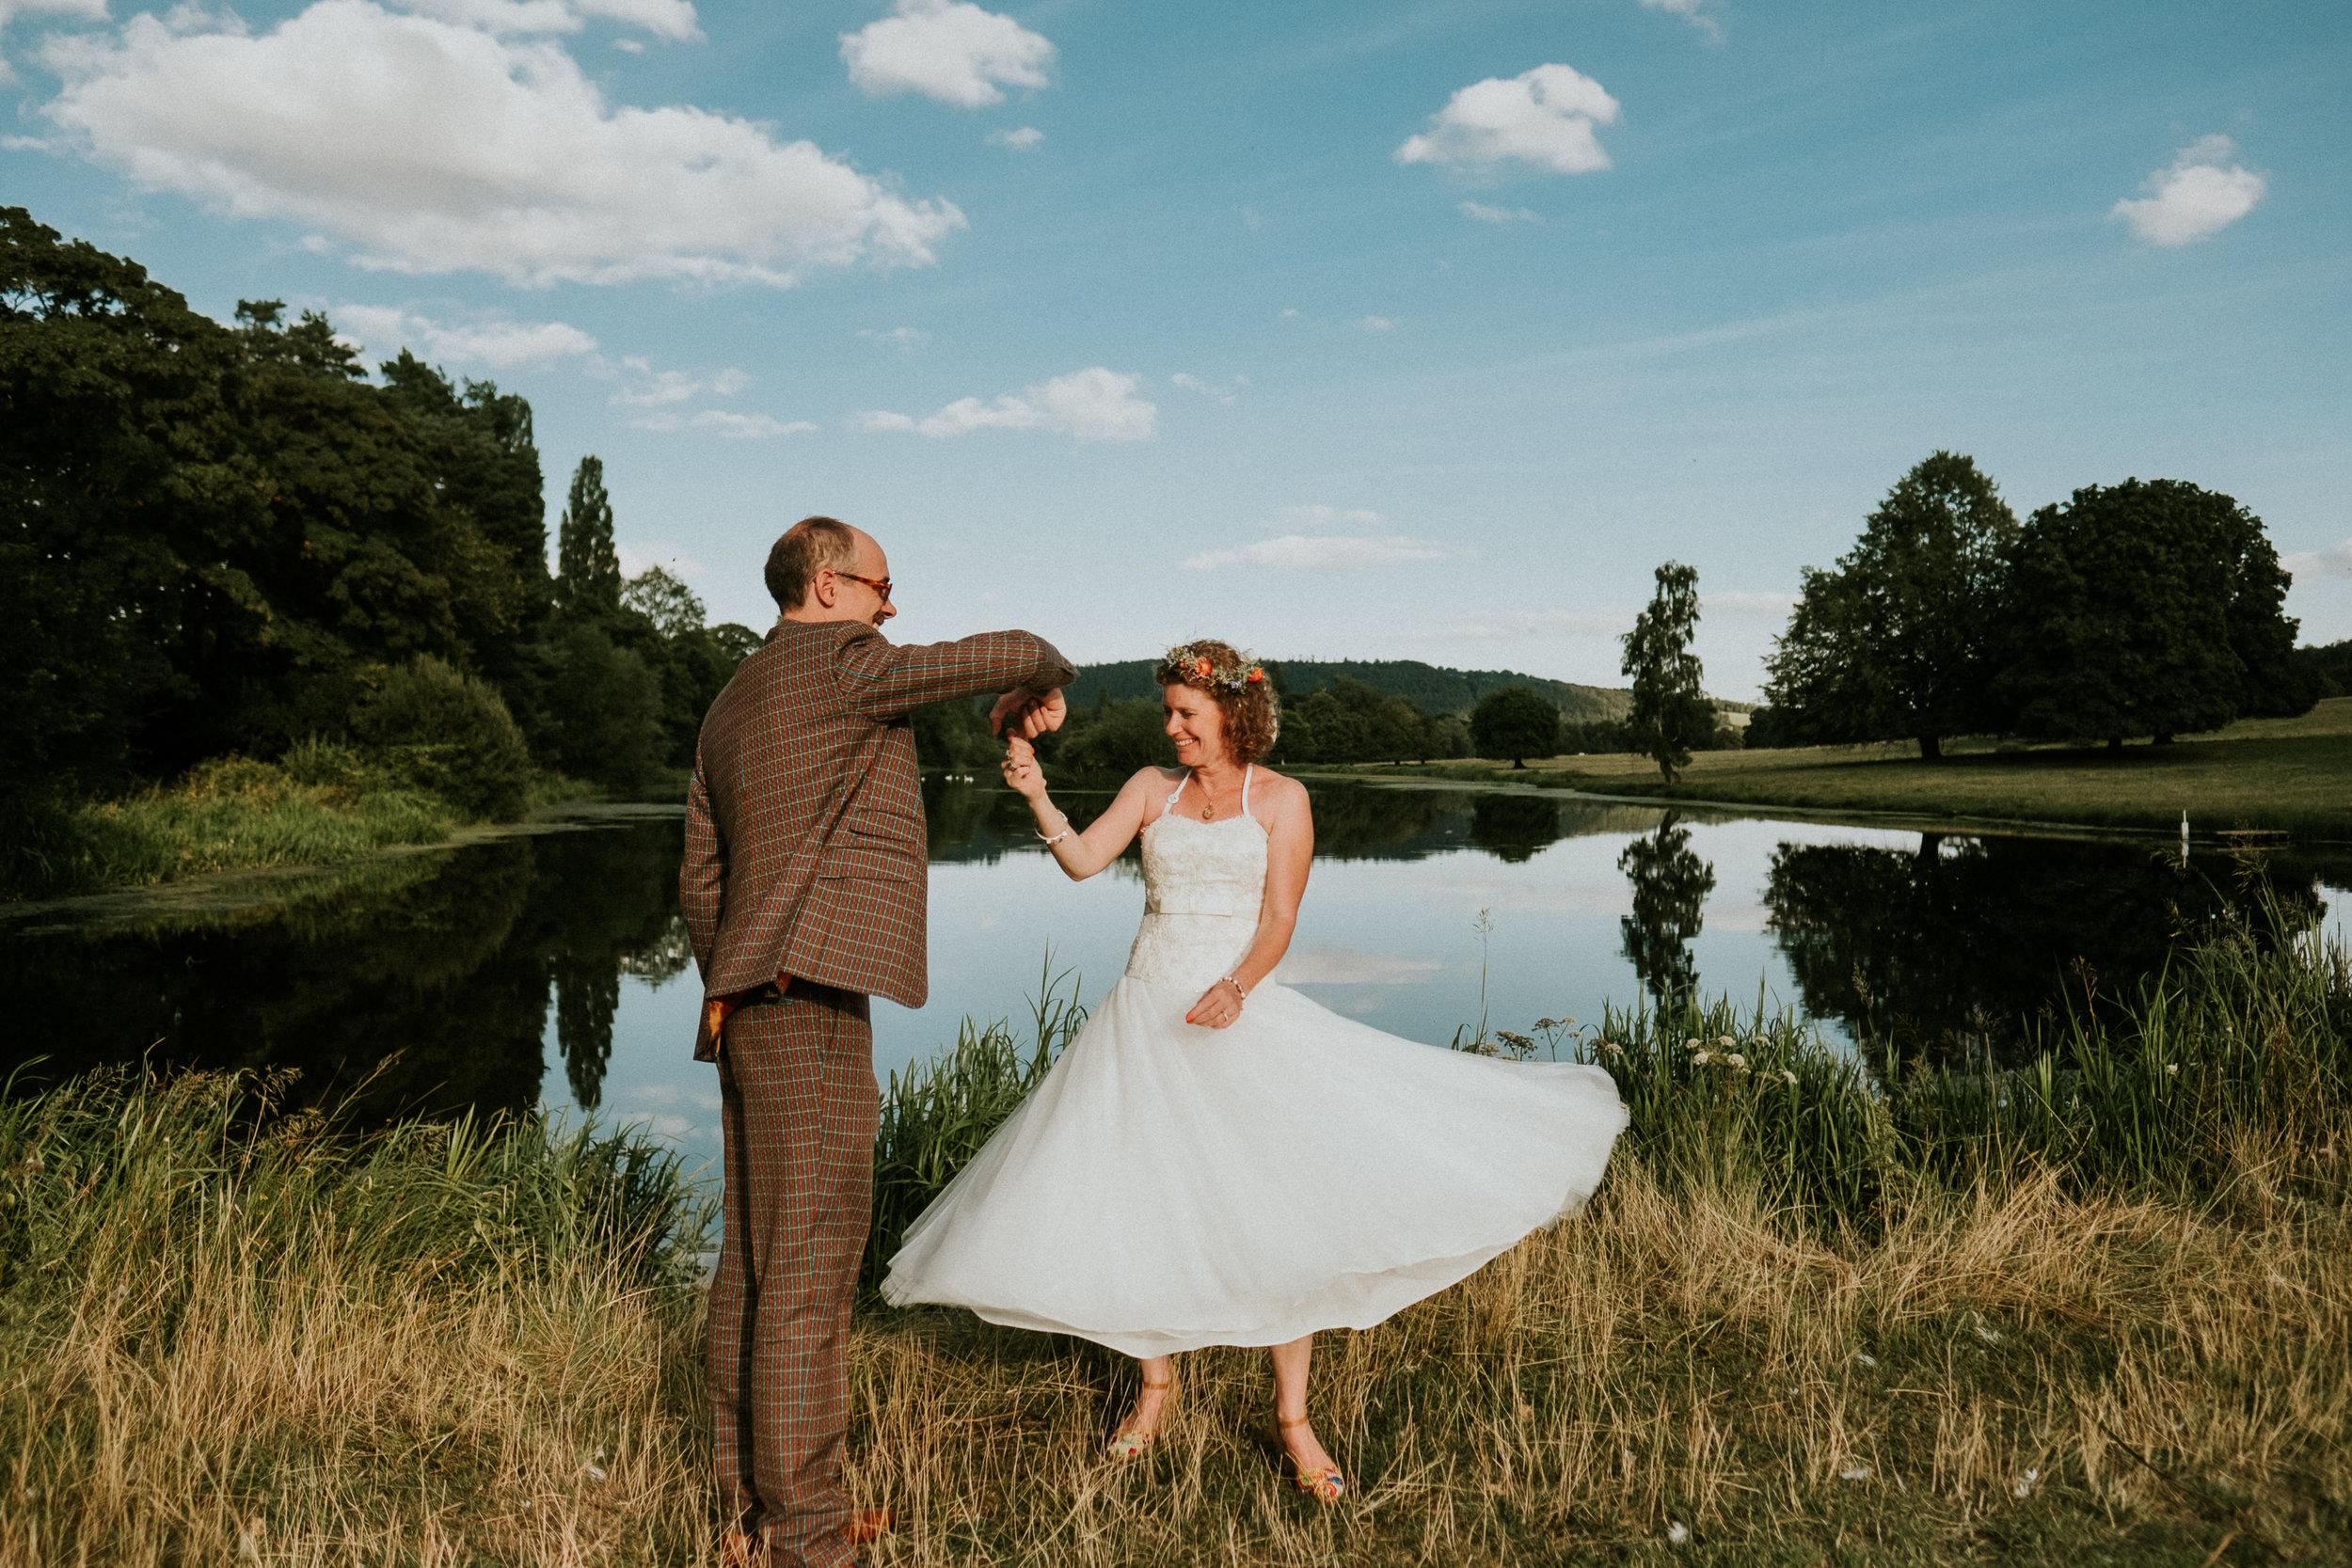 60 Festival wedding smoke bombs fun creative cool joanna nicole photography1.jpg